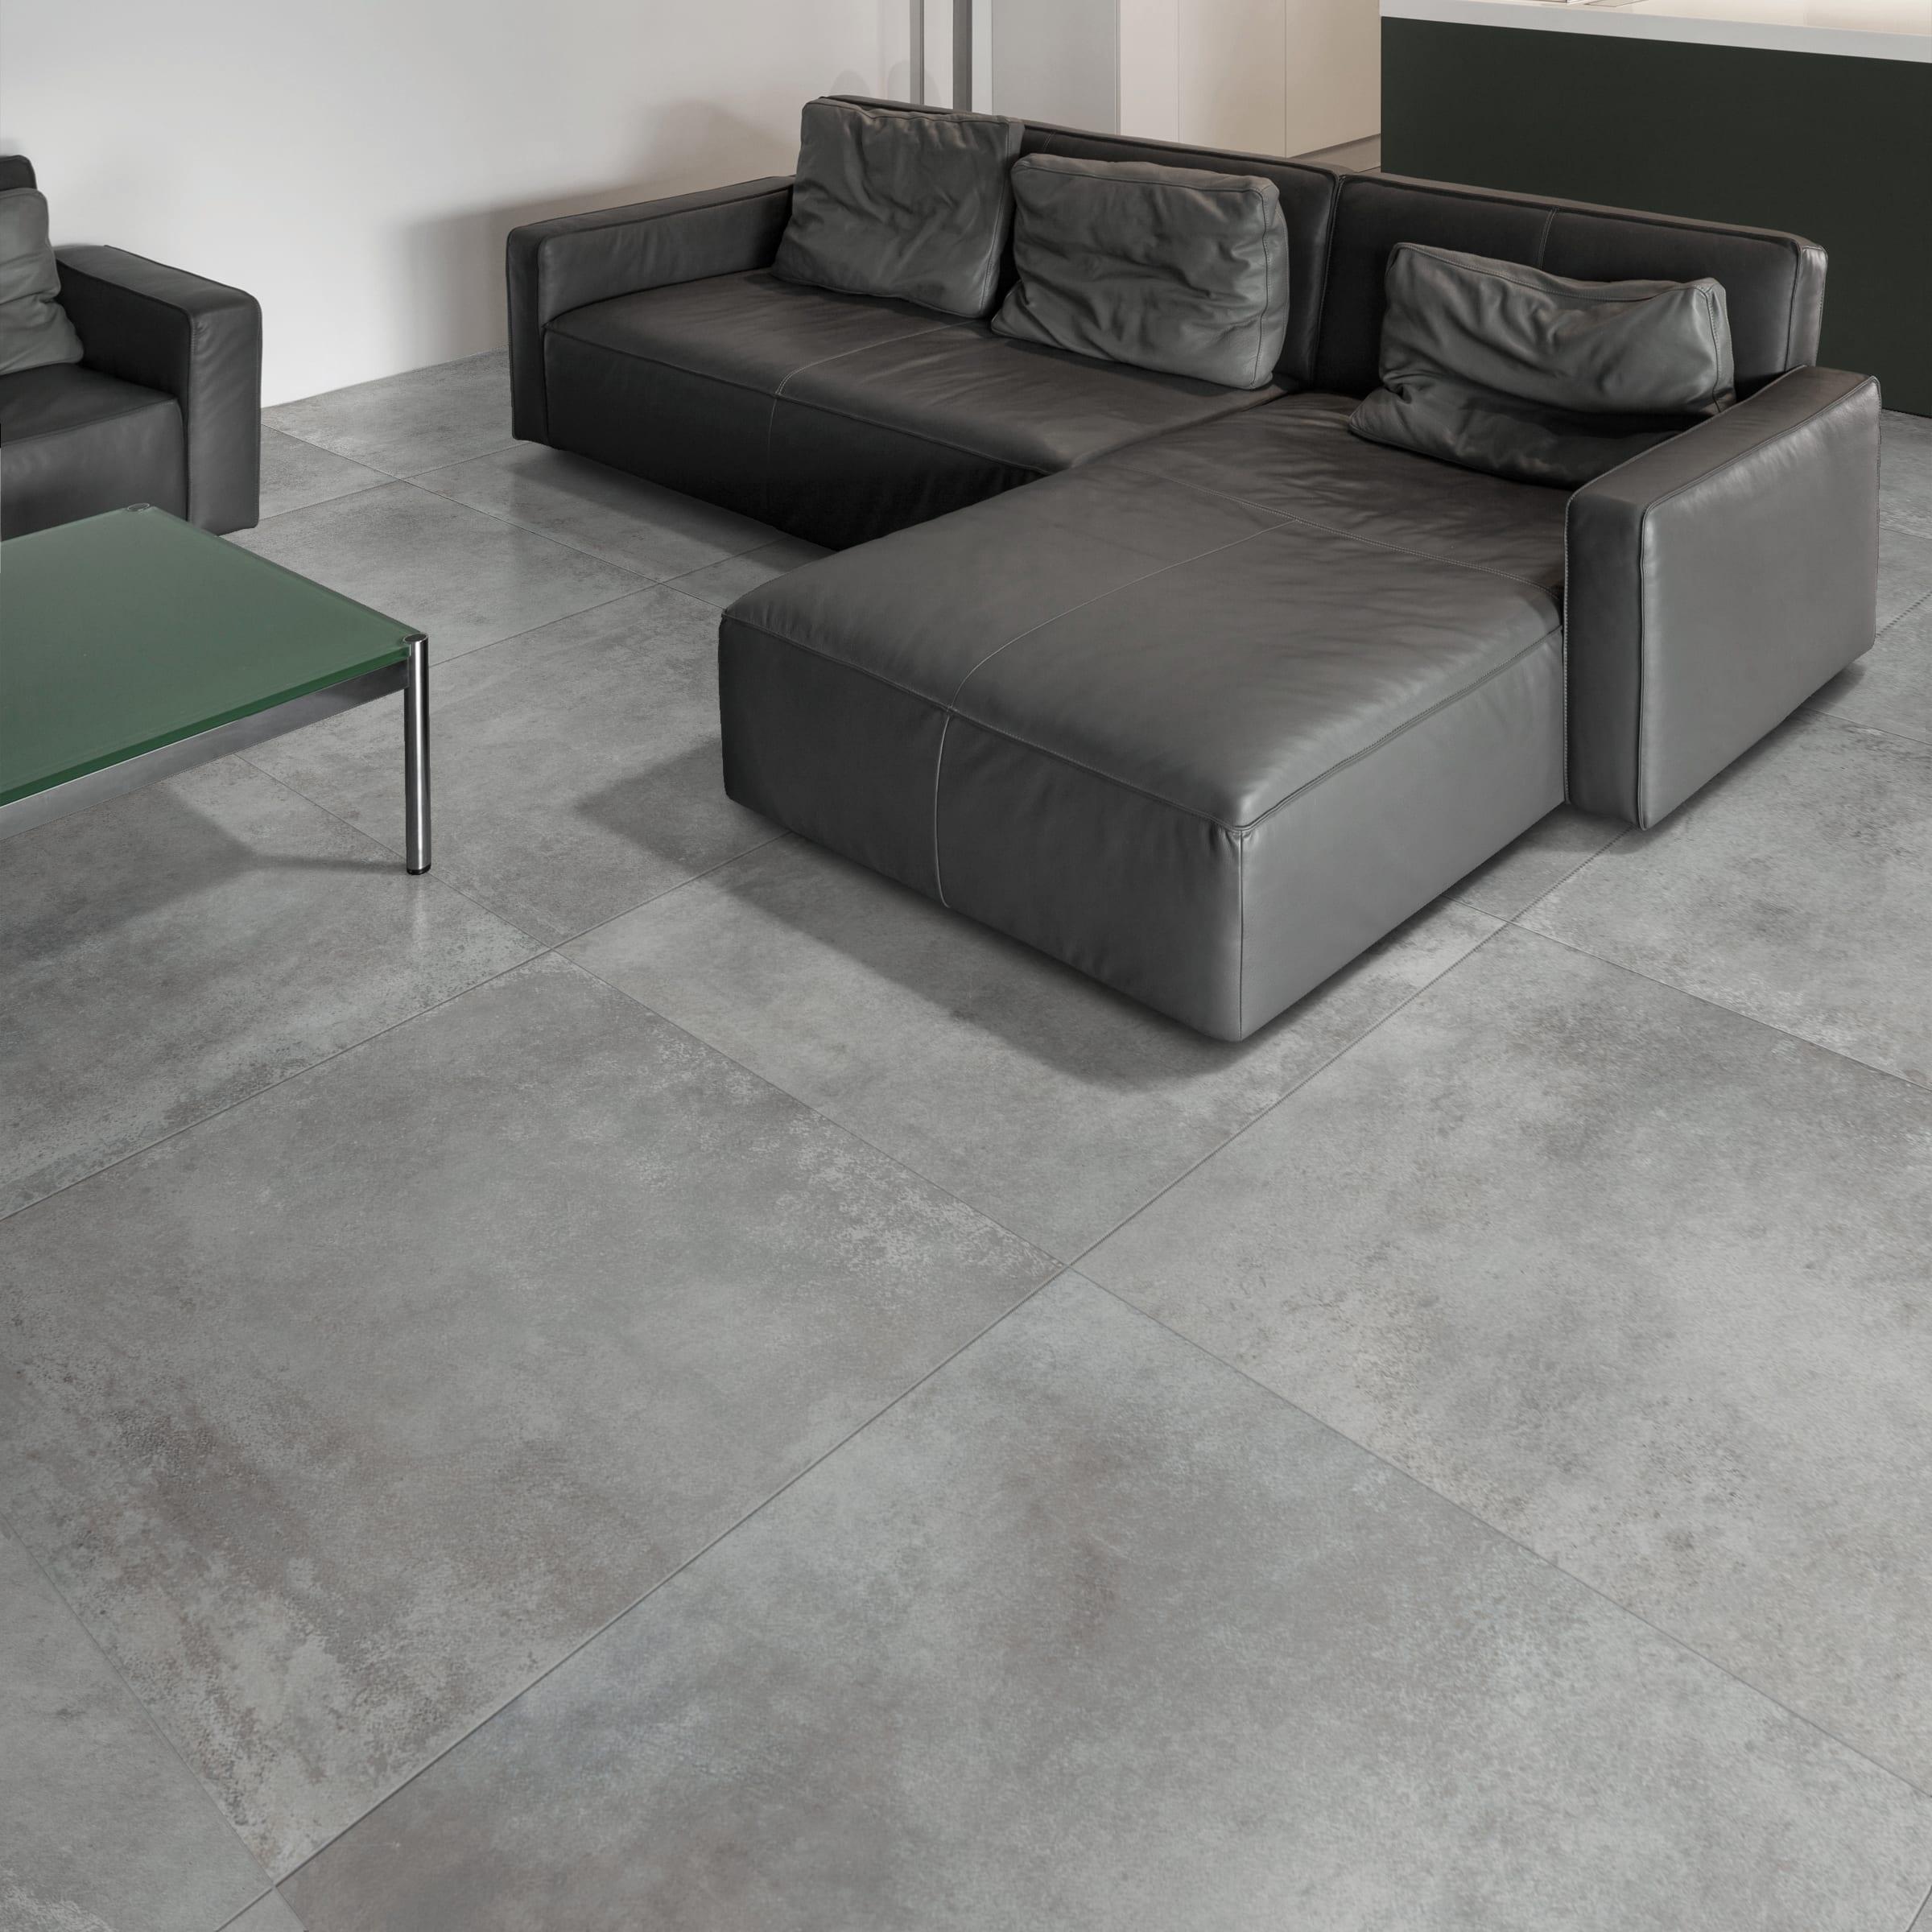 Fuga Minima Pavimento Rettificato piastrella argento 90 x 90 cm sp. 10 mm pei 4/5 argento